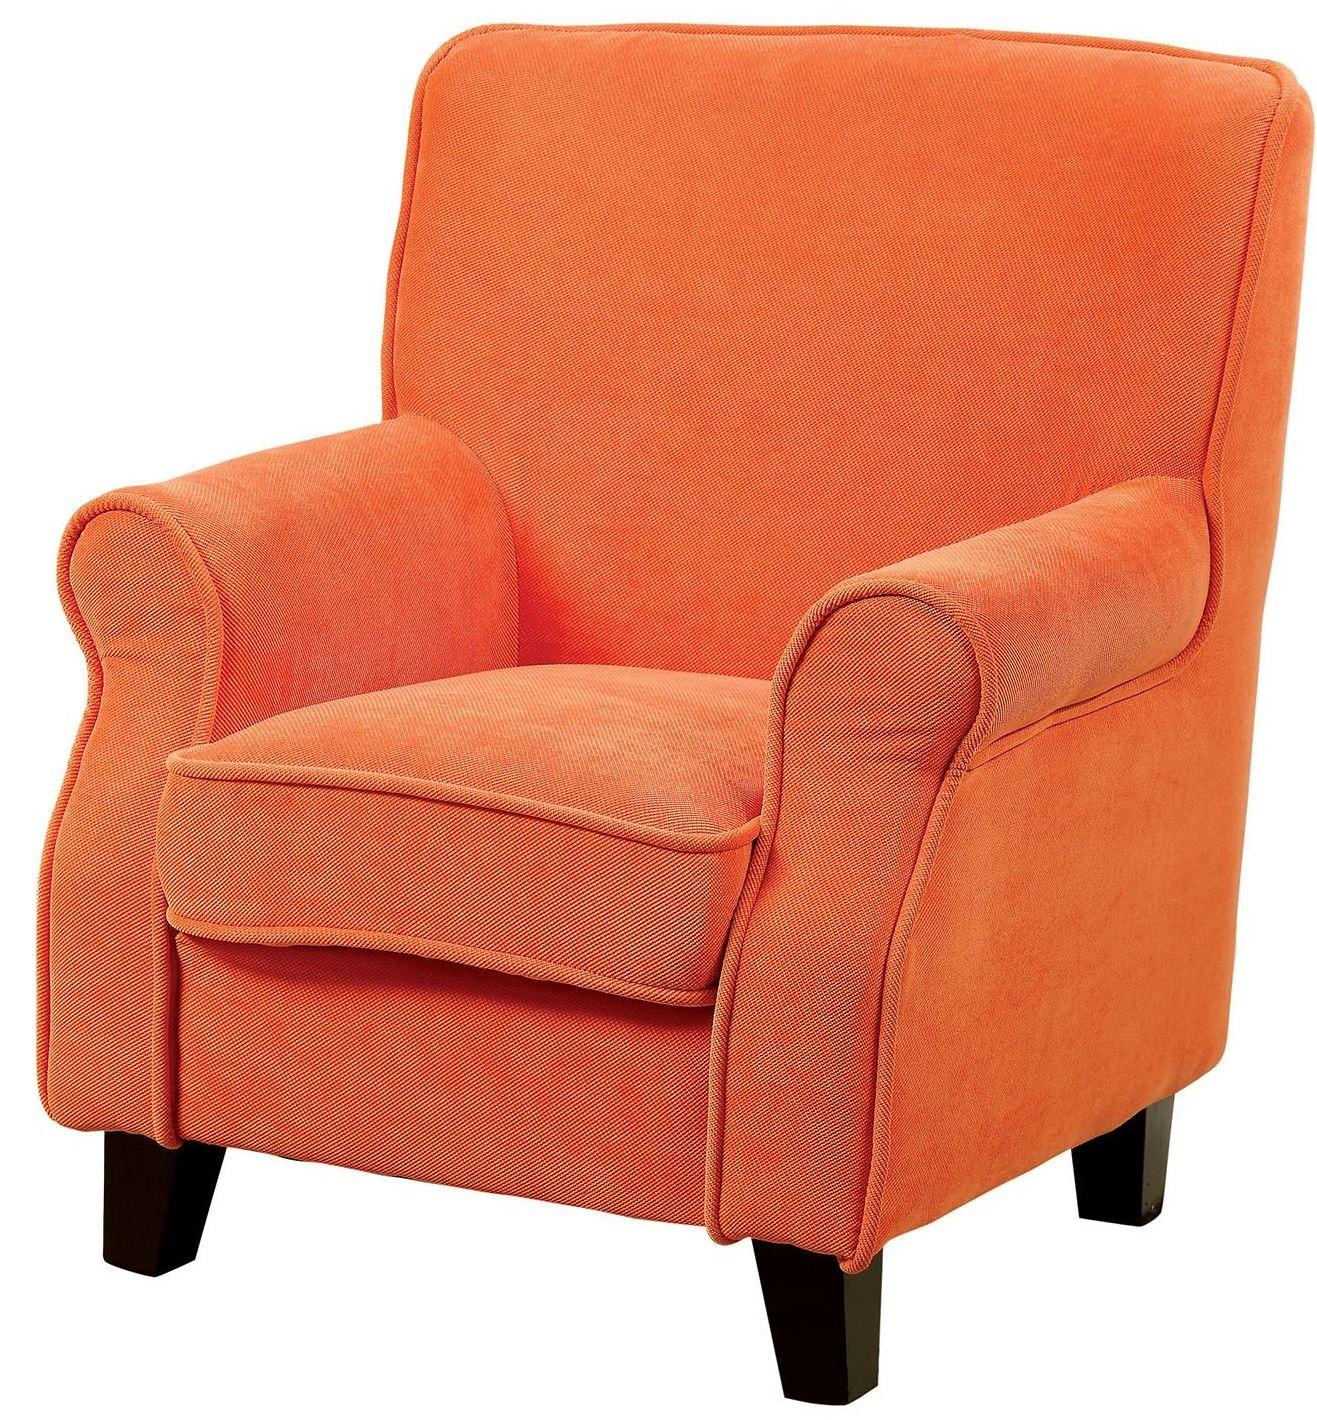 Greta orange kids chair from furniture of america for Orange kids chair